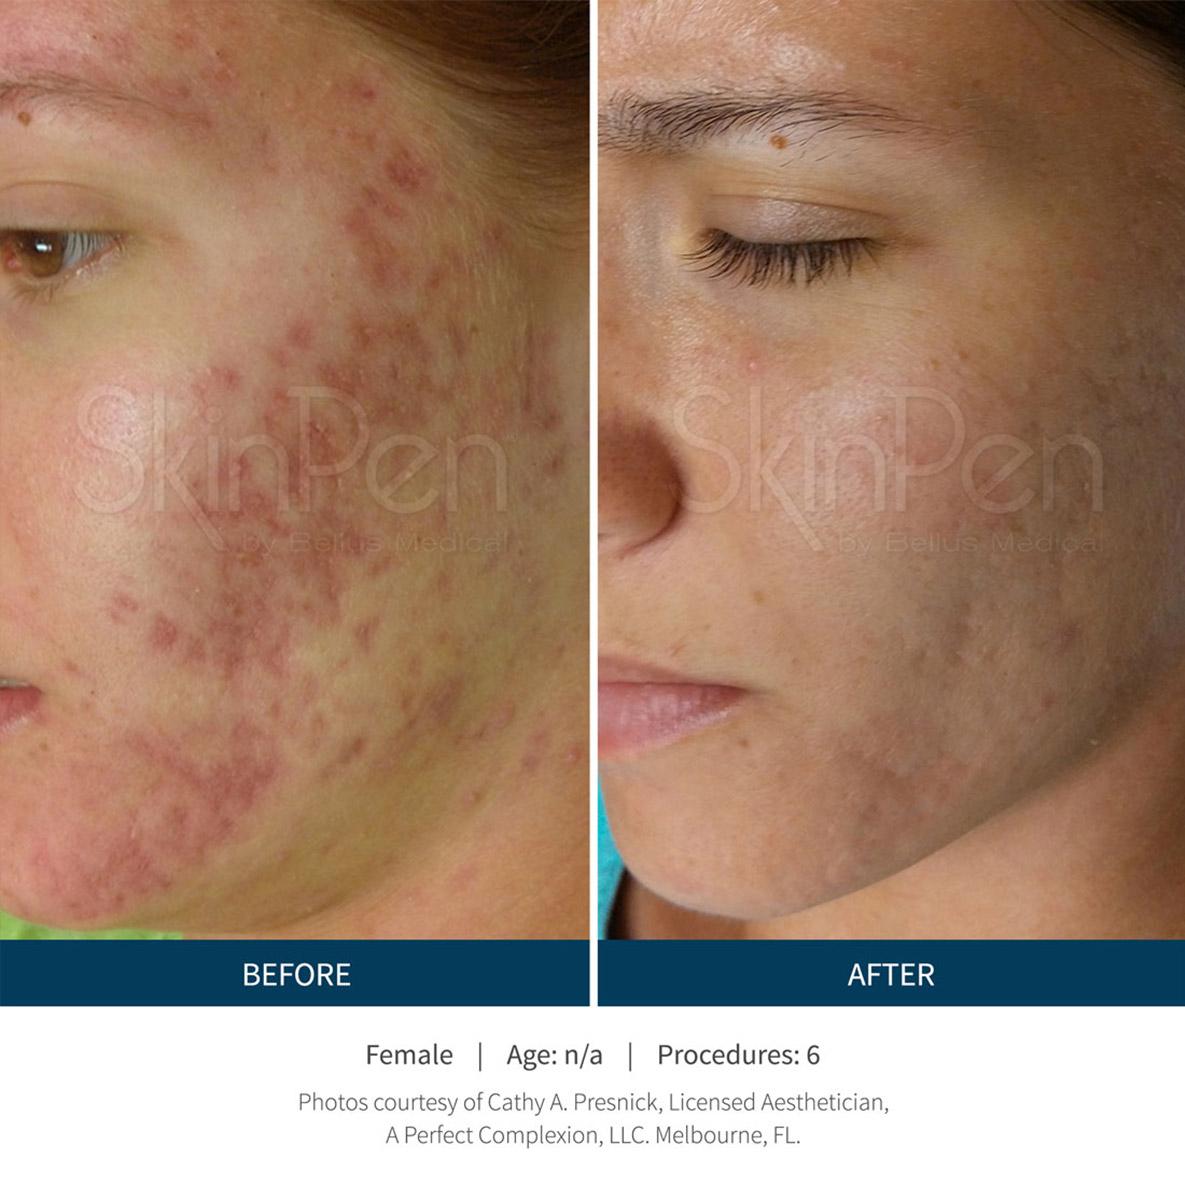 acne scare removal